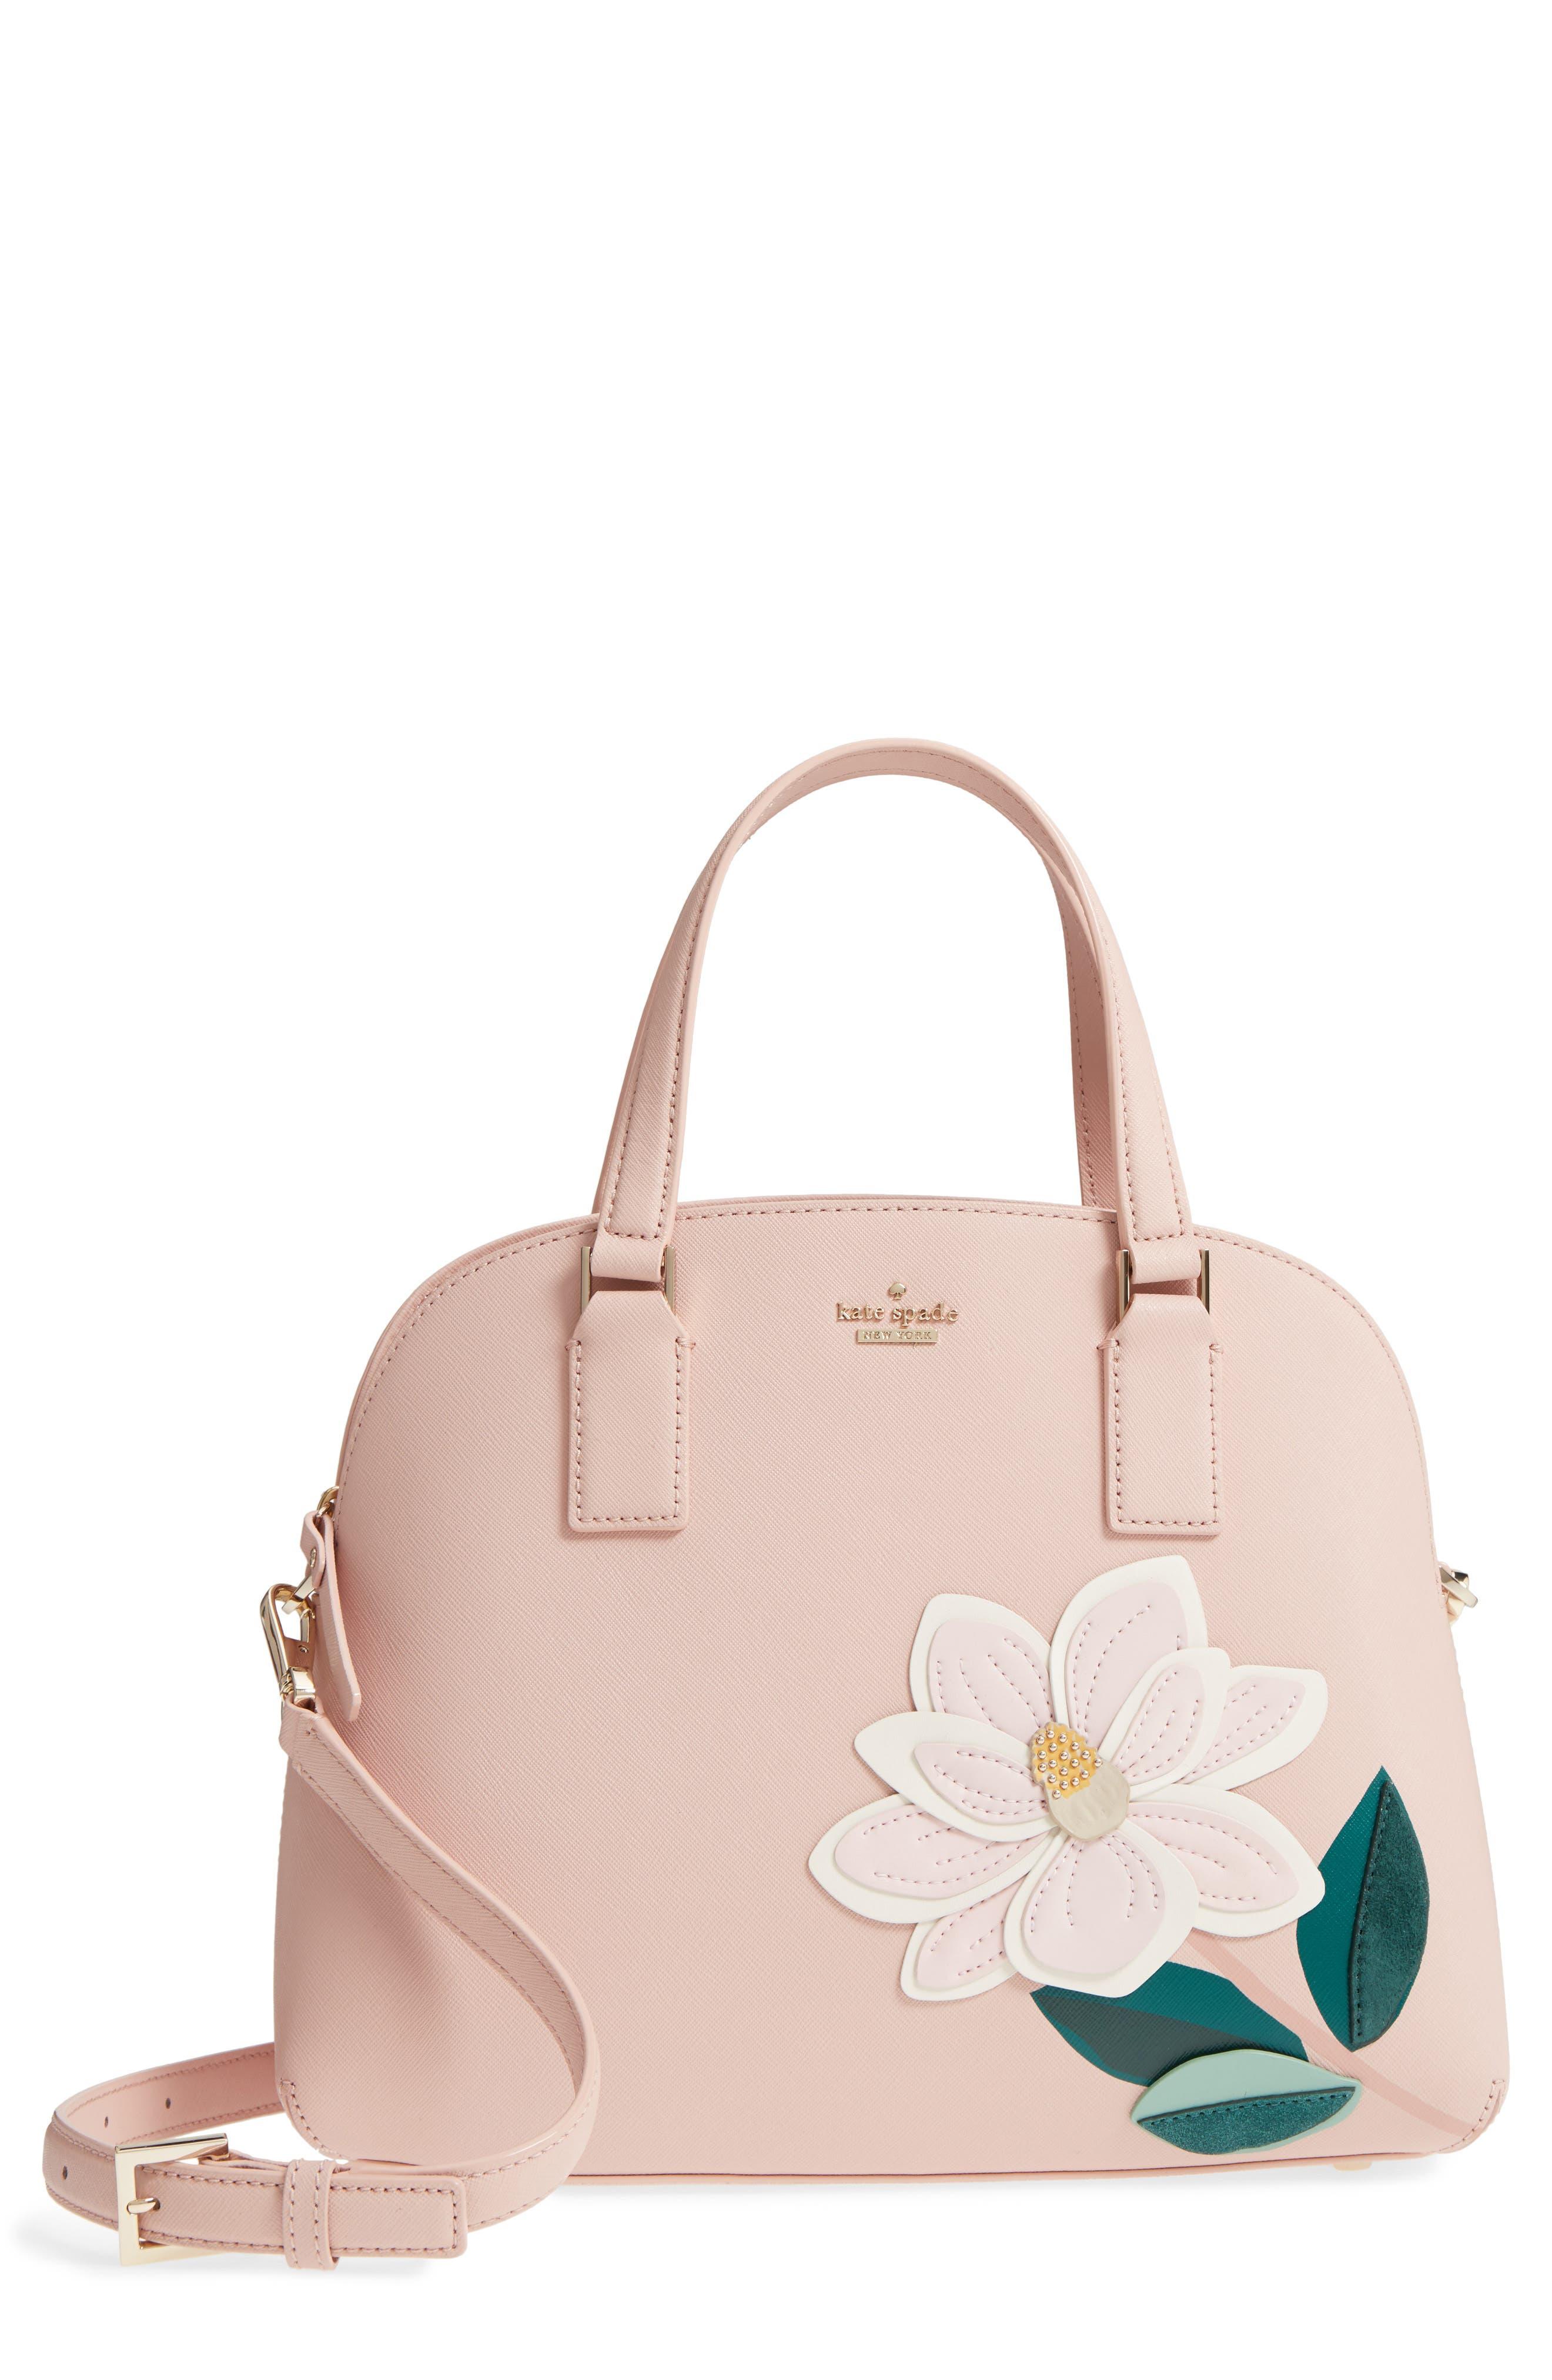 swamped magnolia - lottie leather satchel,                         Main,                         color, 650